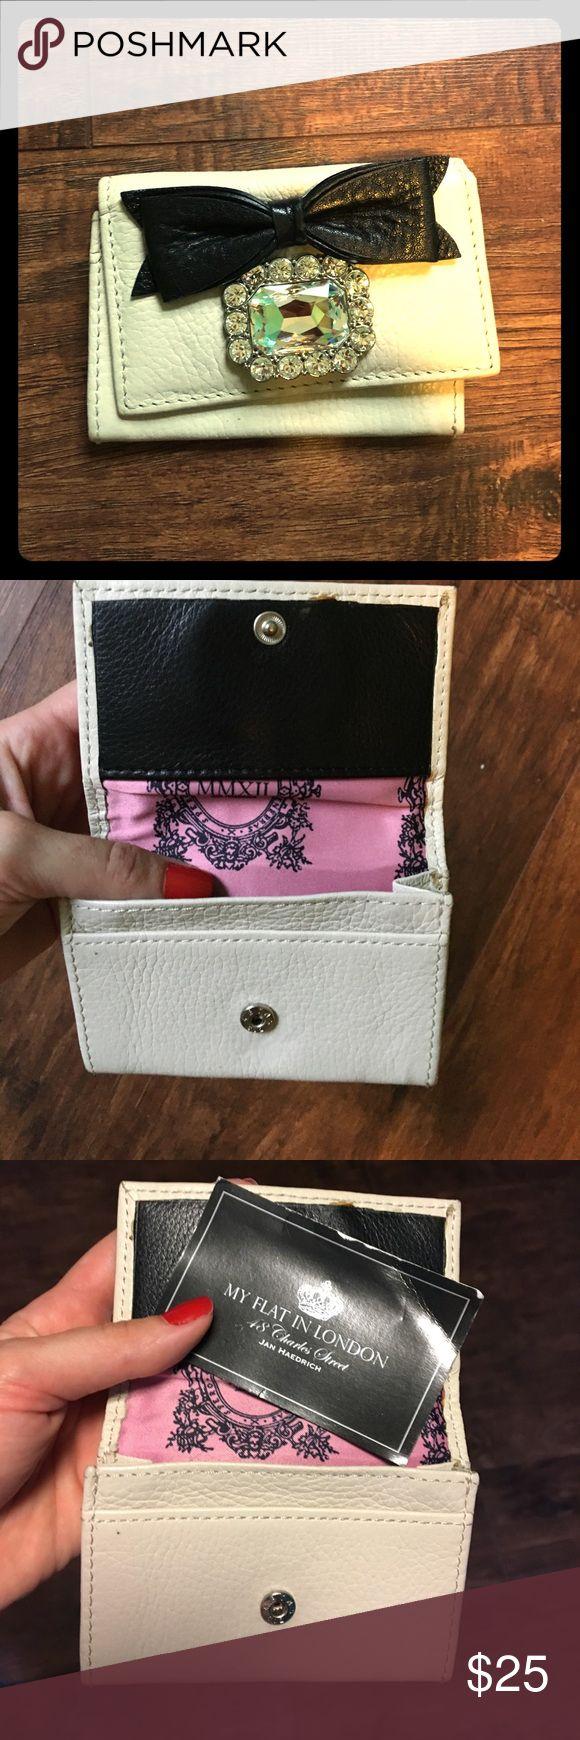 "Small glitzy wallet  by My Flat in London Adorable little beige wallet. ""My Flat in London"" never used. Tags still inside wallet. Misplaced dust bag My Flat in London Bags Wallets"